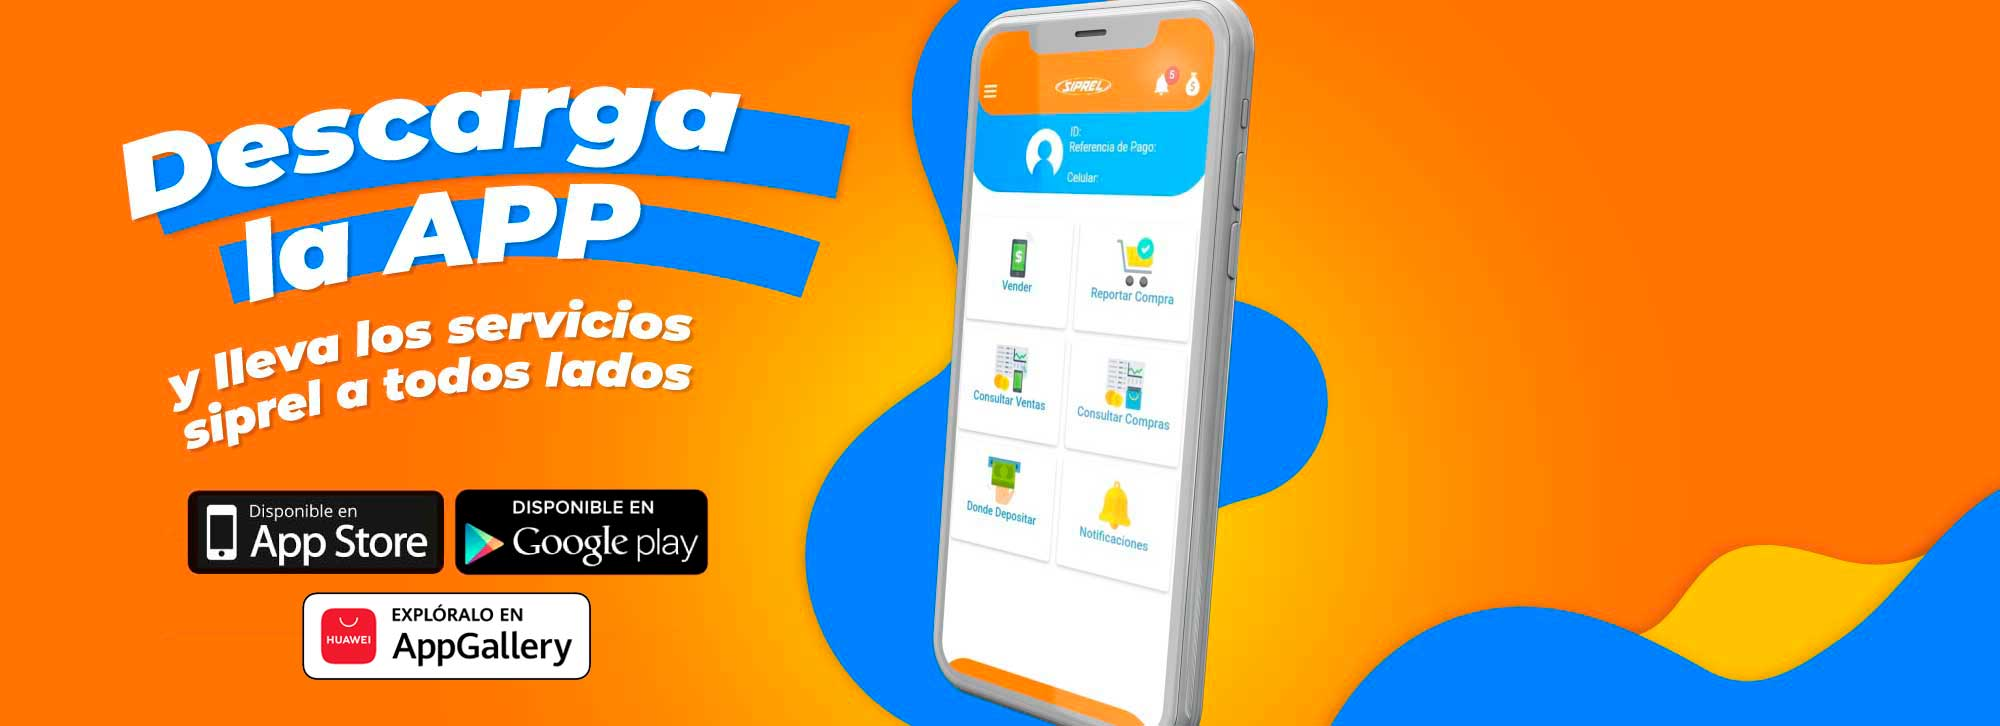 app para vender recargas